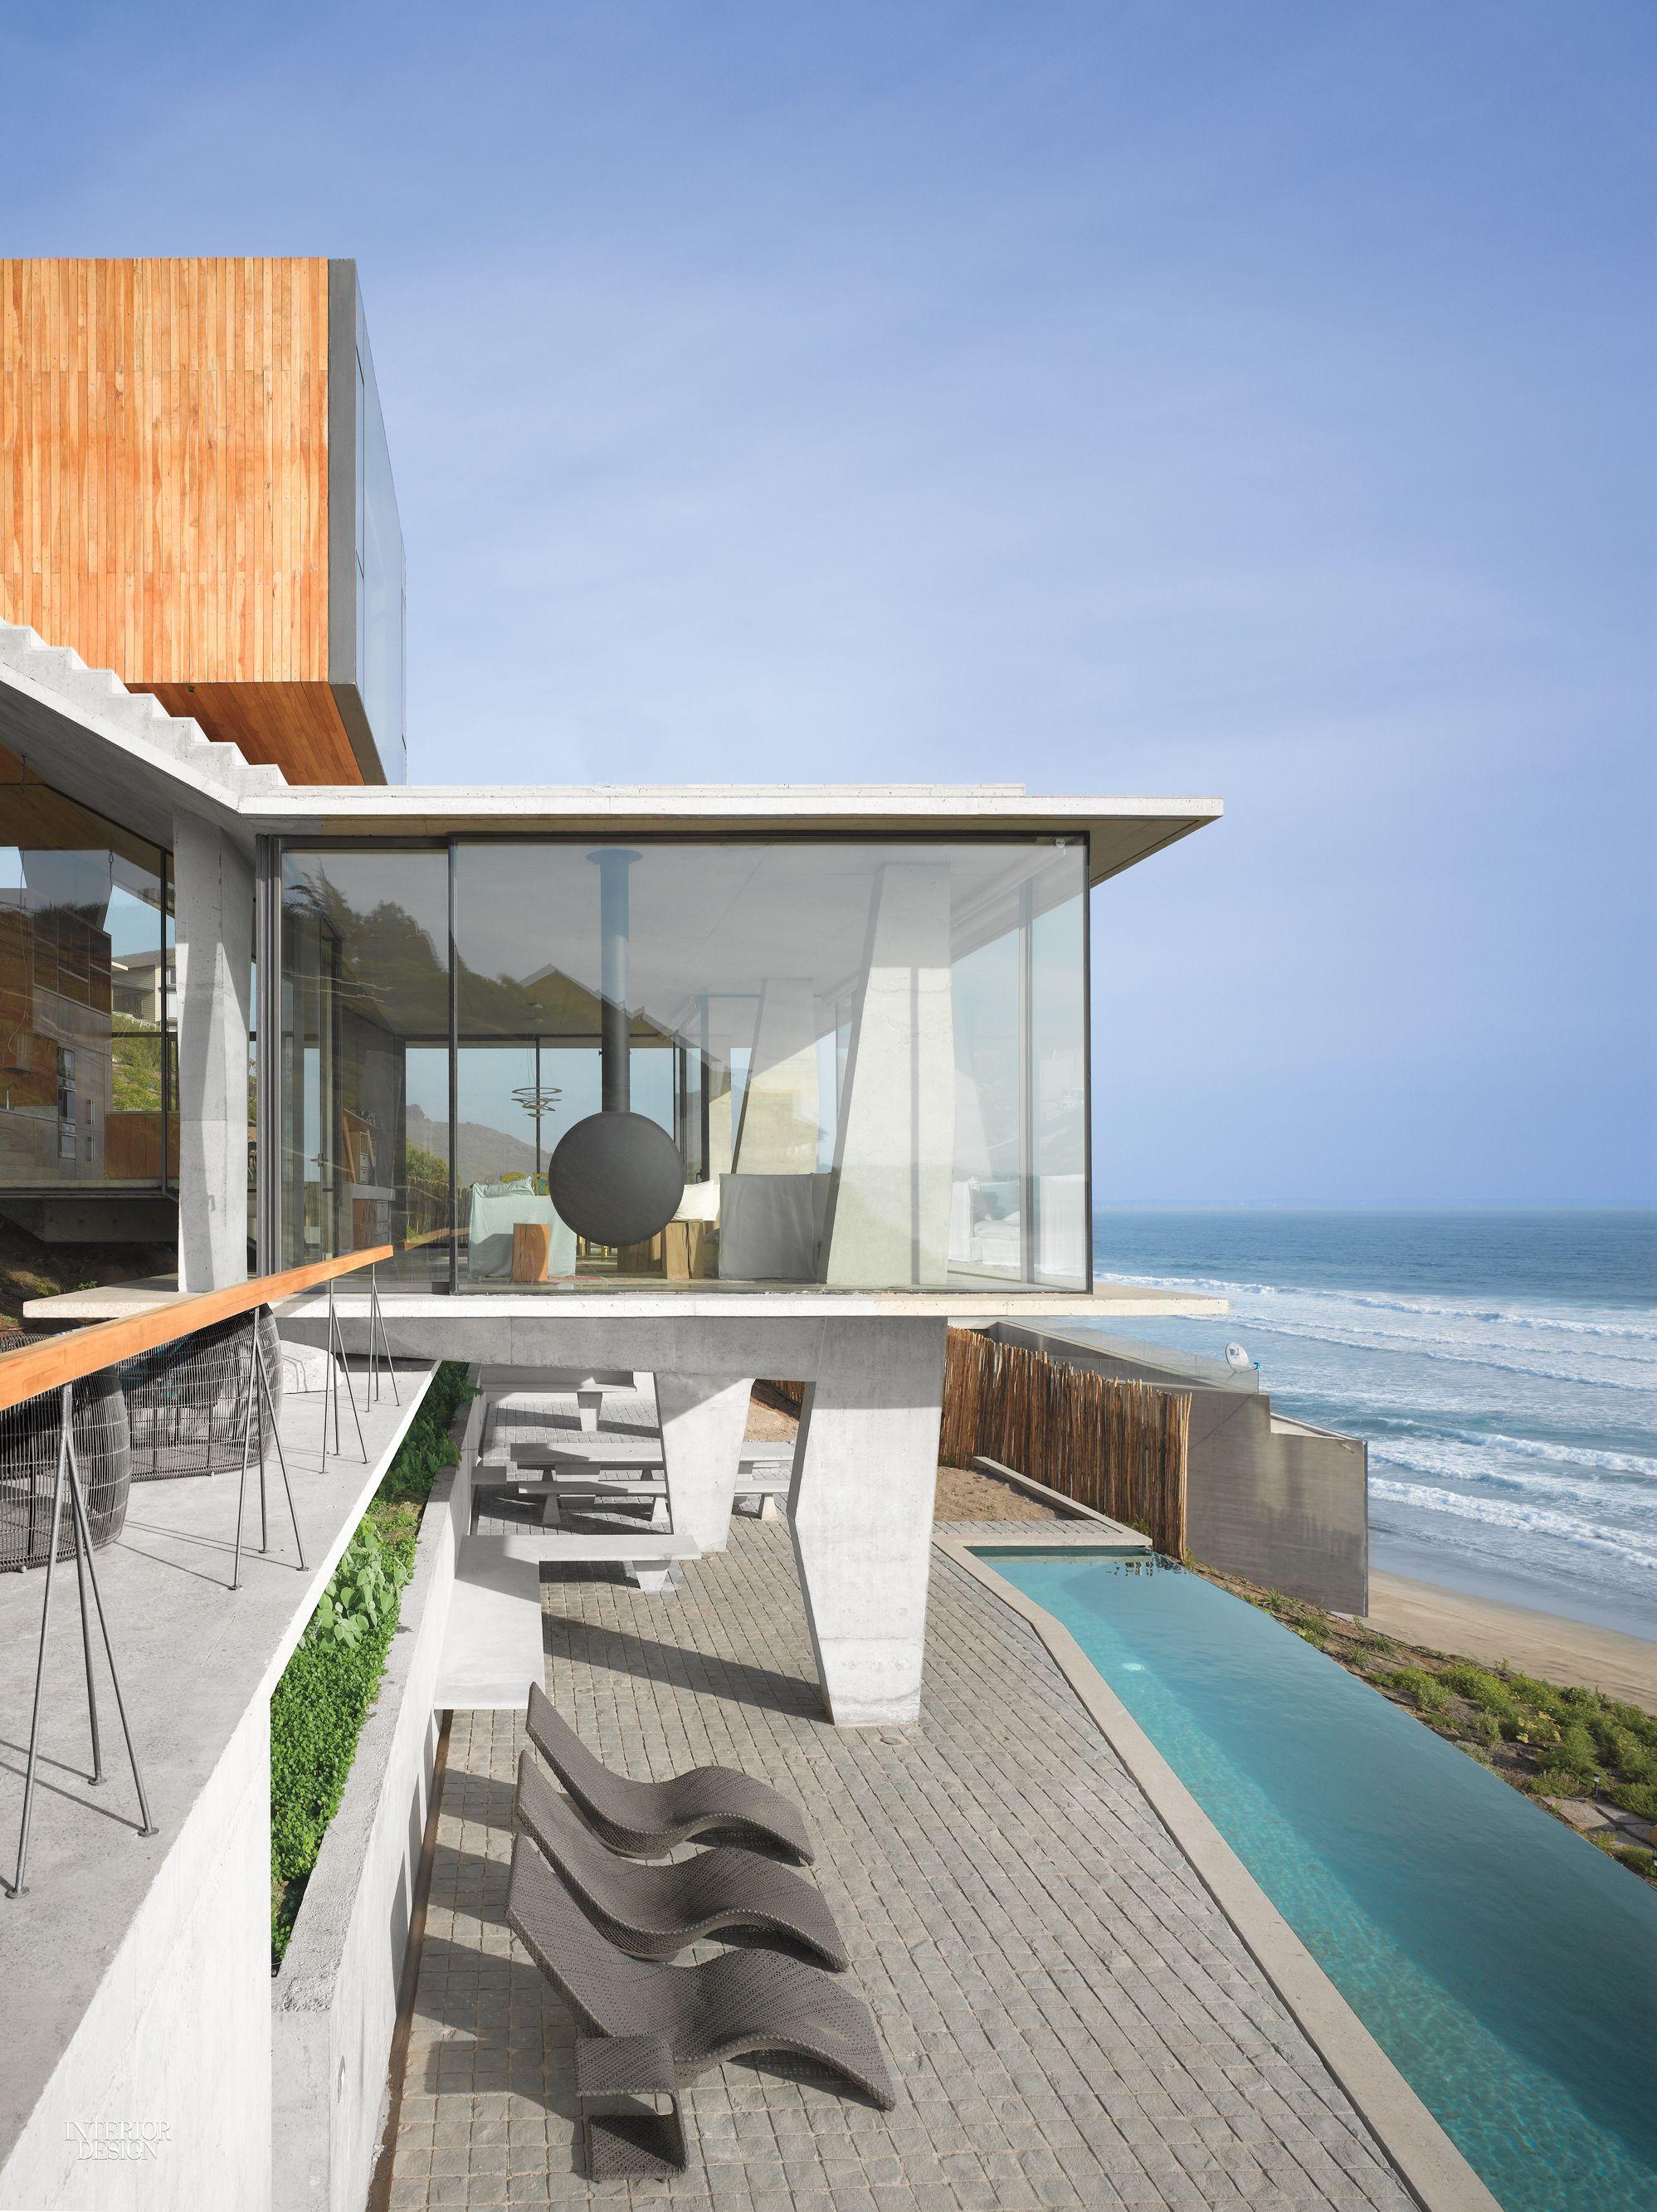 Max Núñez Arquitectos Embraces the Topography in an Avant-Garde ...